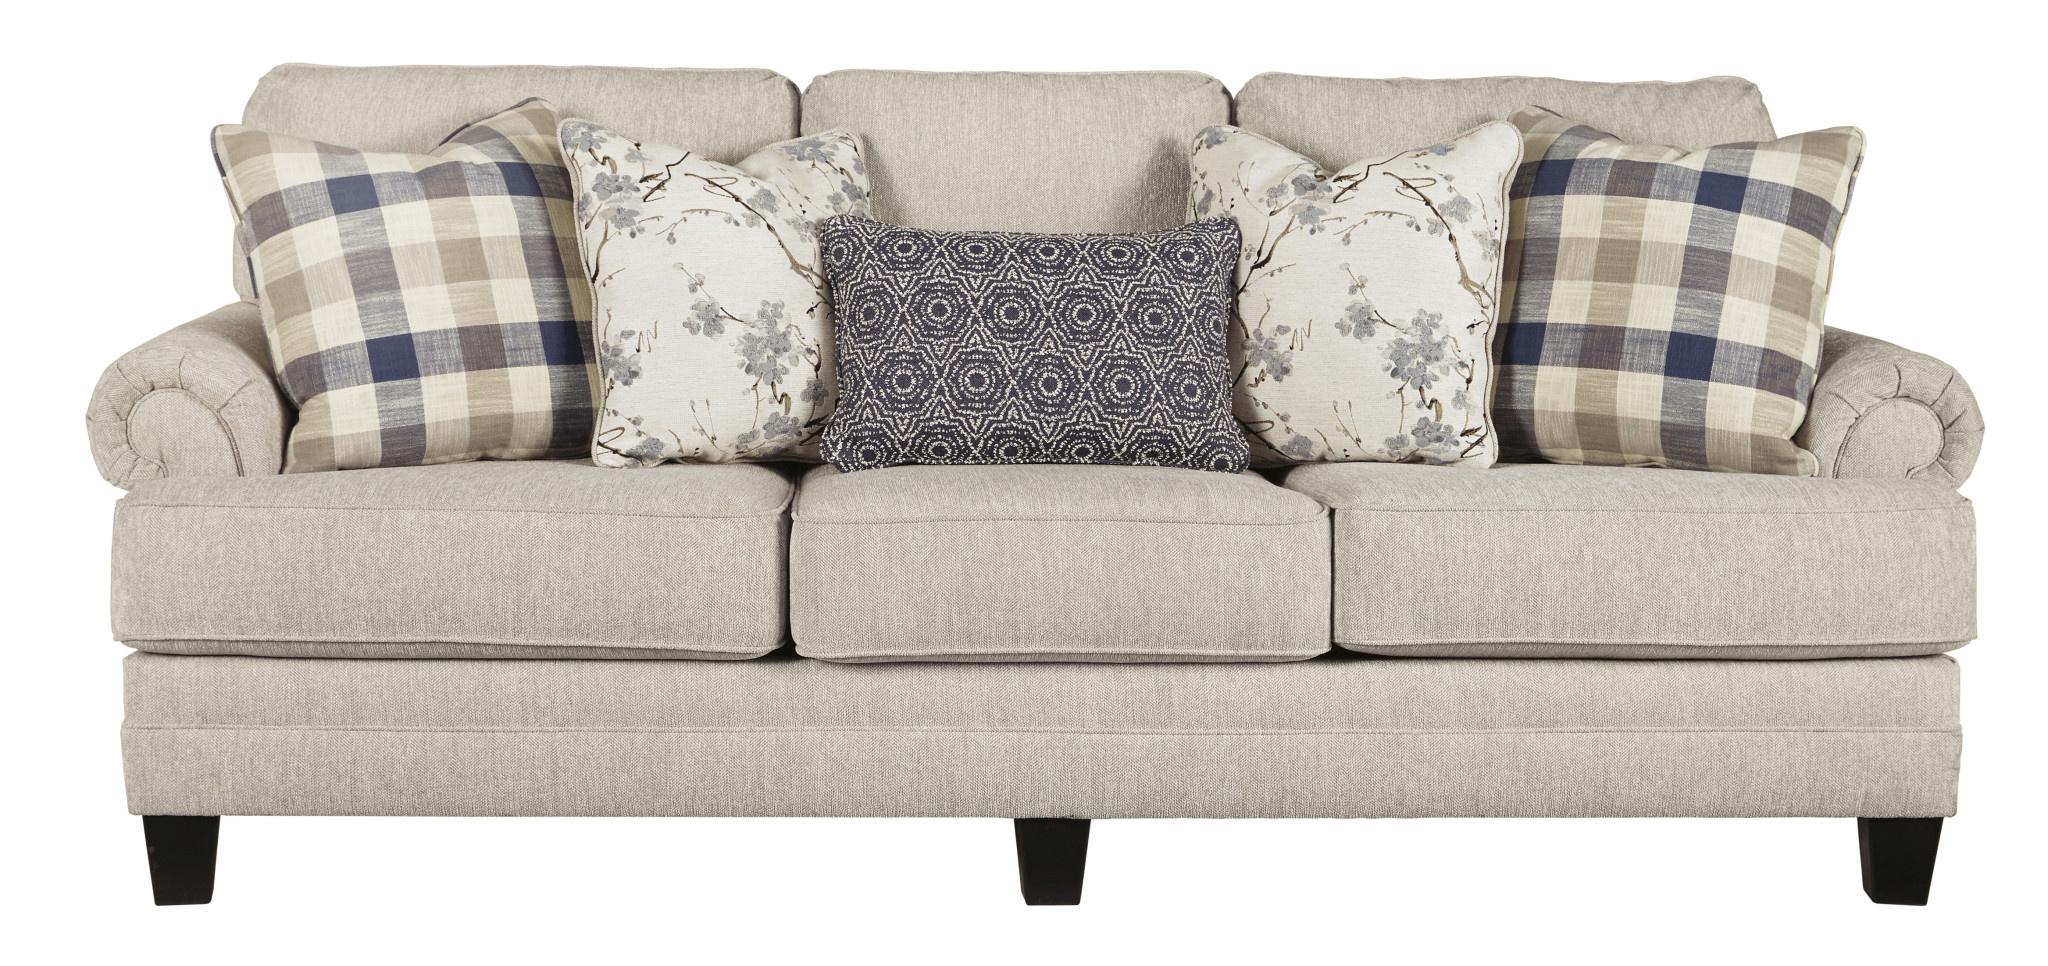 "Benchcraft ""Megget"" Sofa- ""Linen"" Color 1950438"